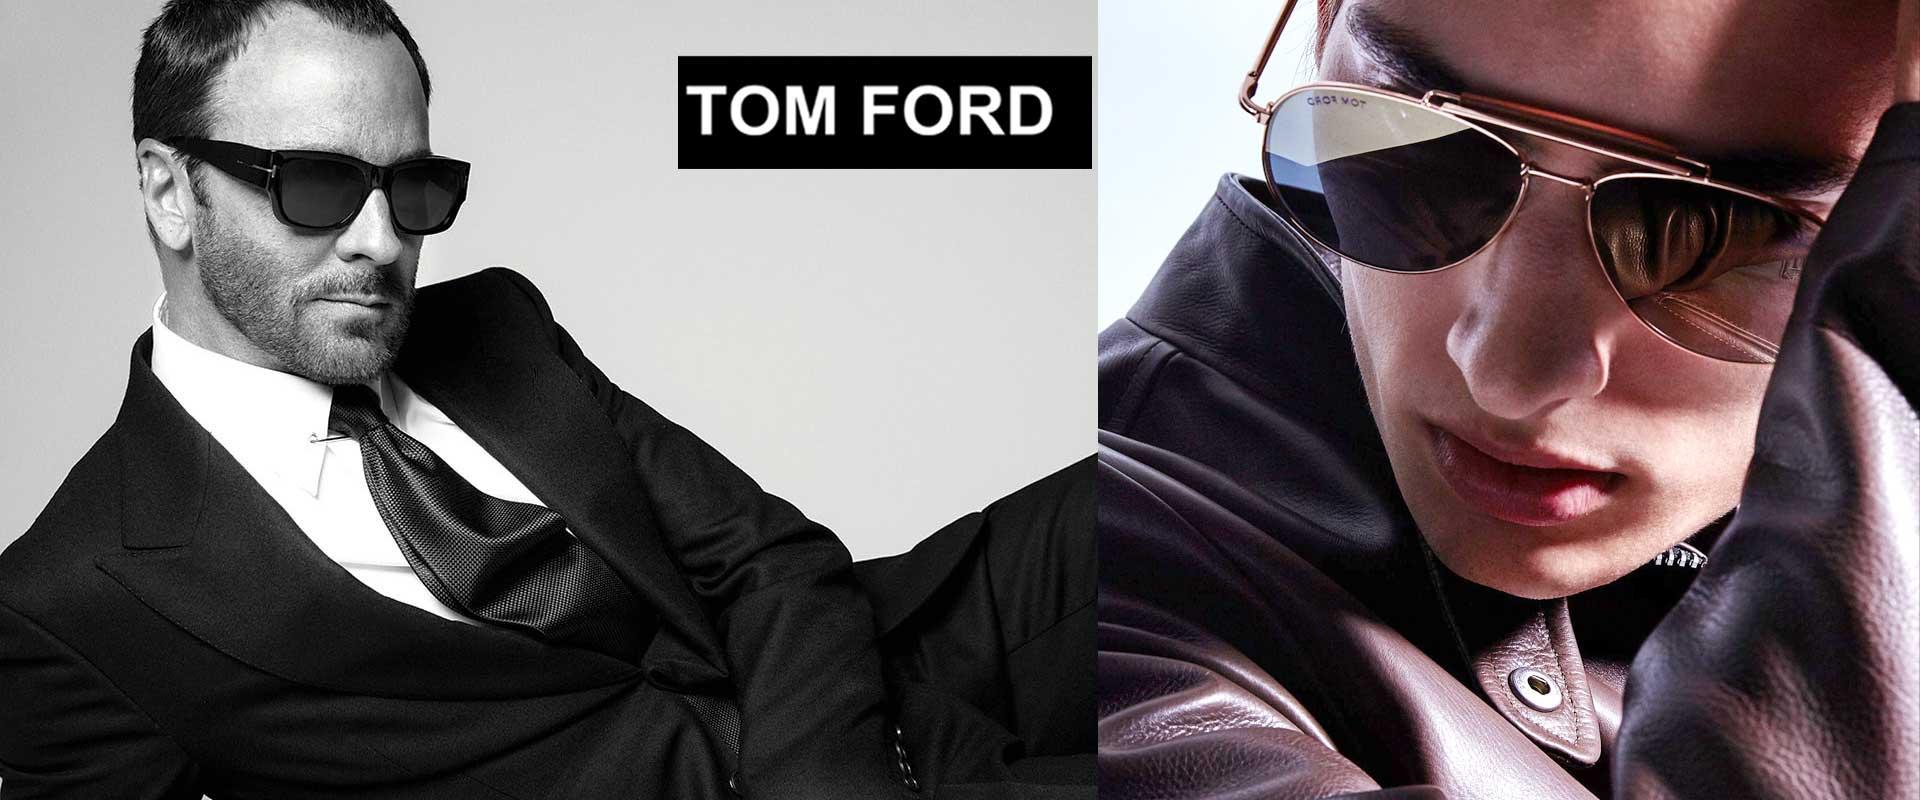 TomFord 11 9 - تام فورد Tom Ford